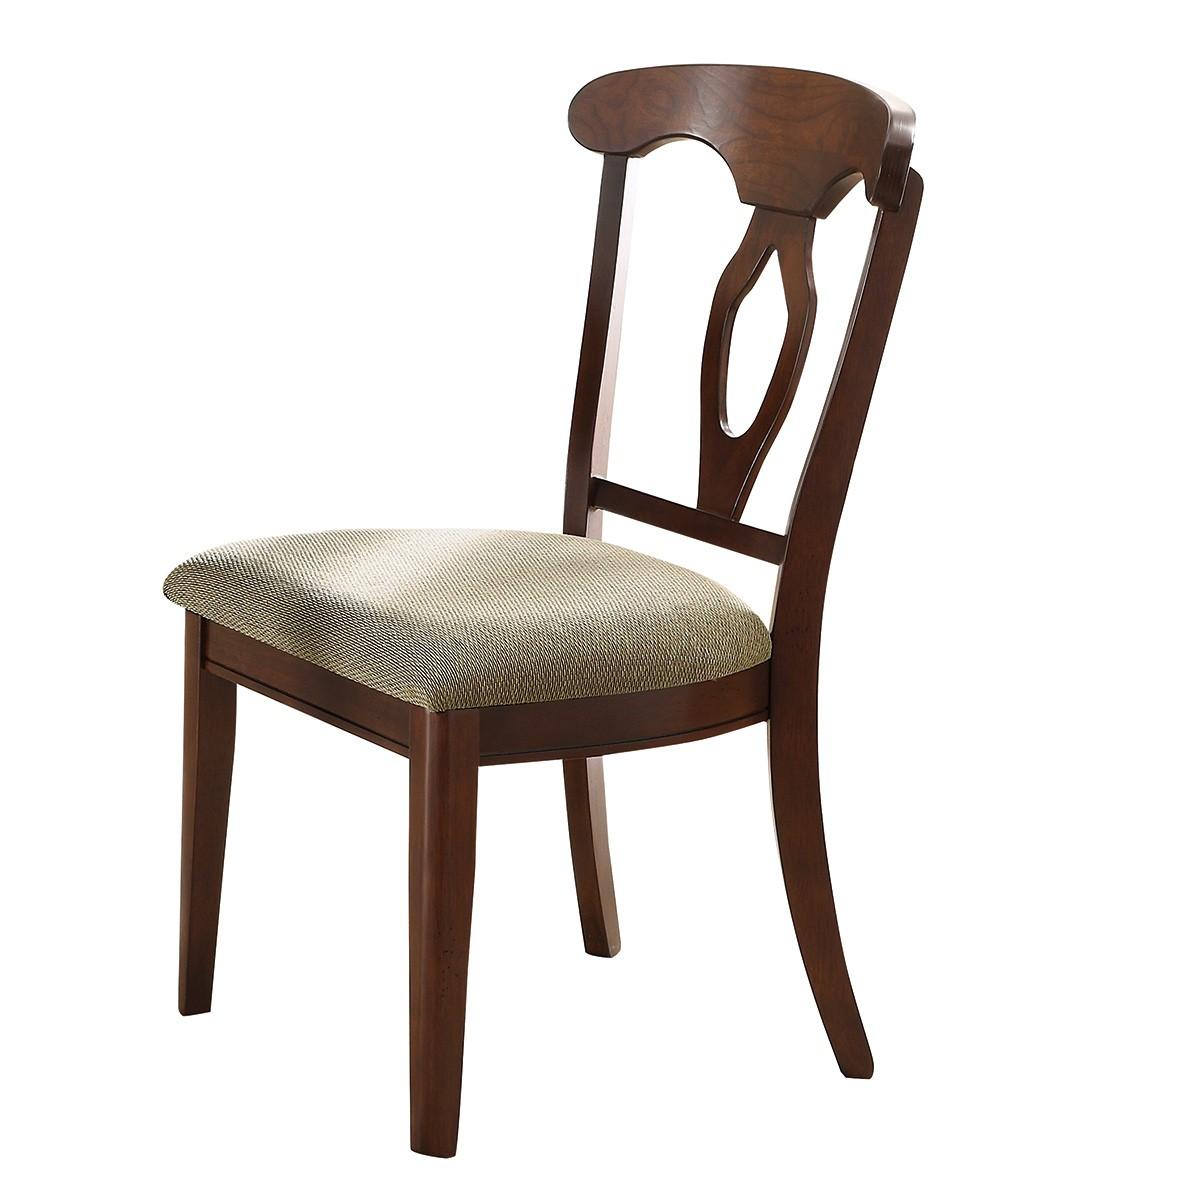 Latest Dining Chairs: New Modern Coaster Liam Decorative Splat Back Cherry